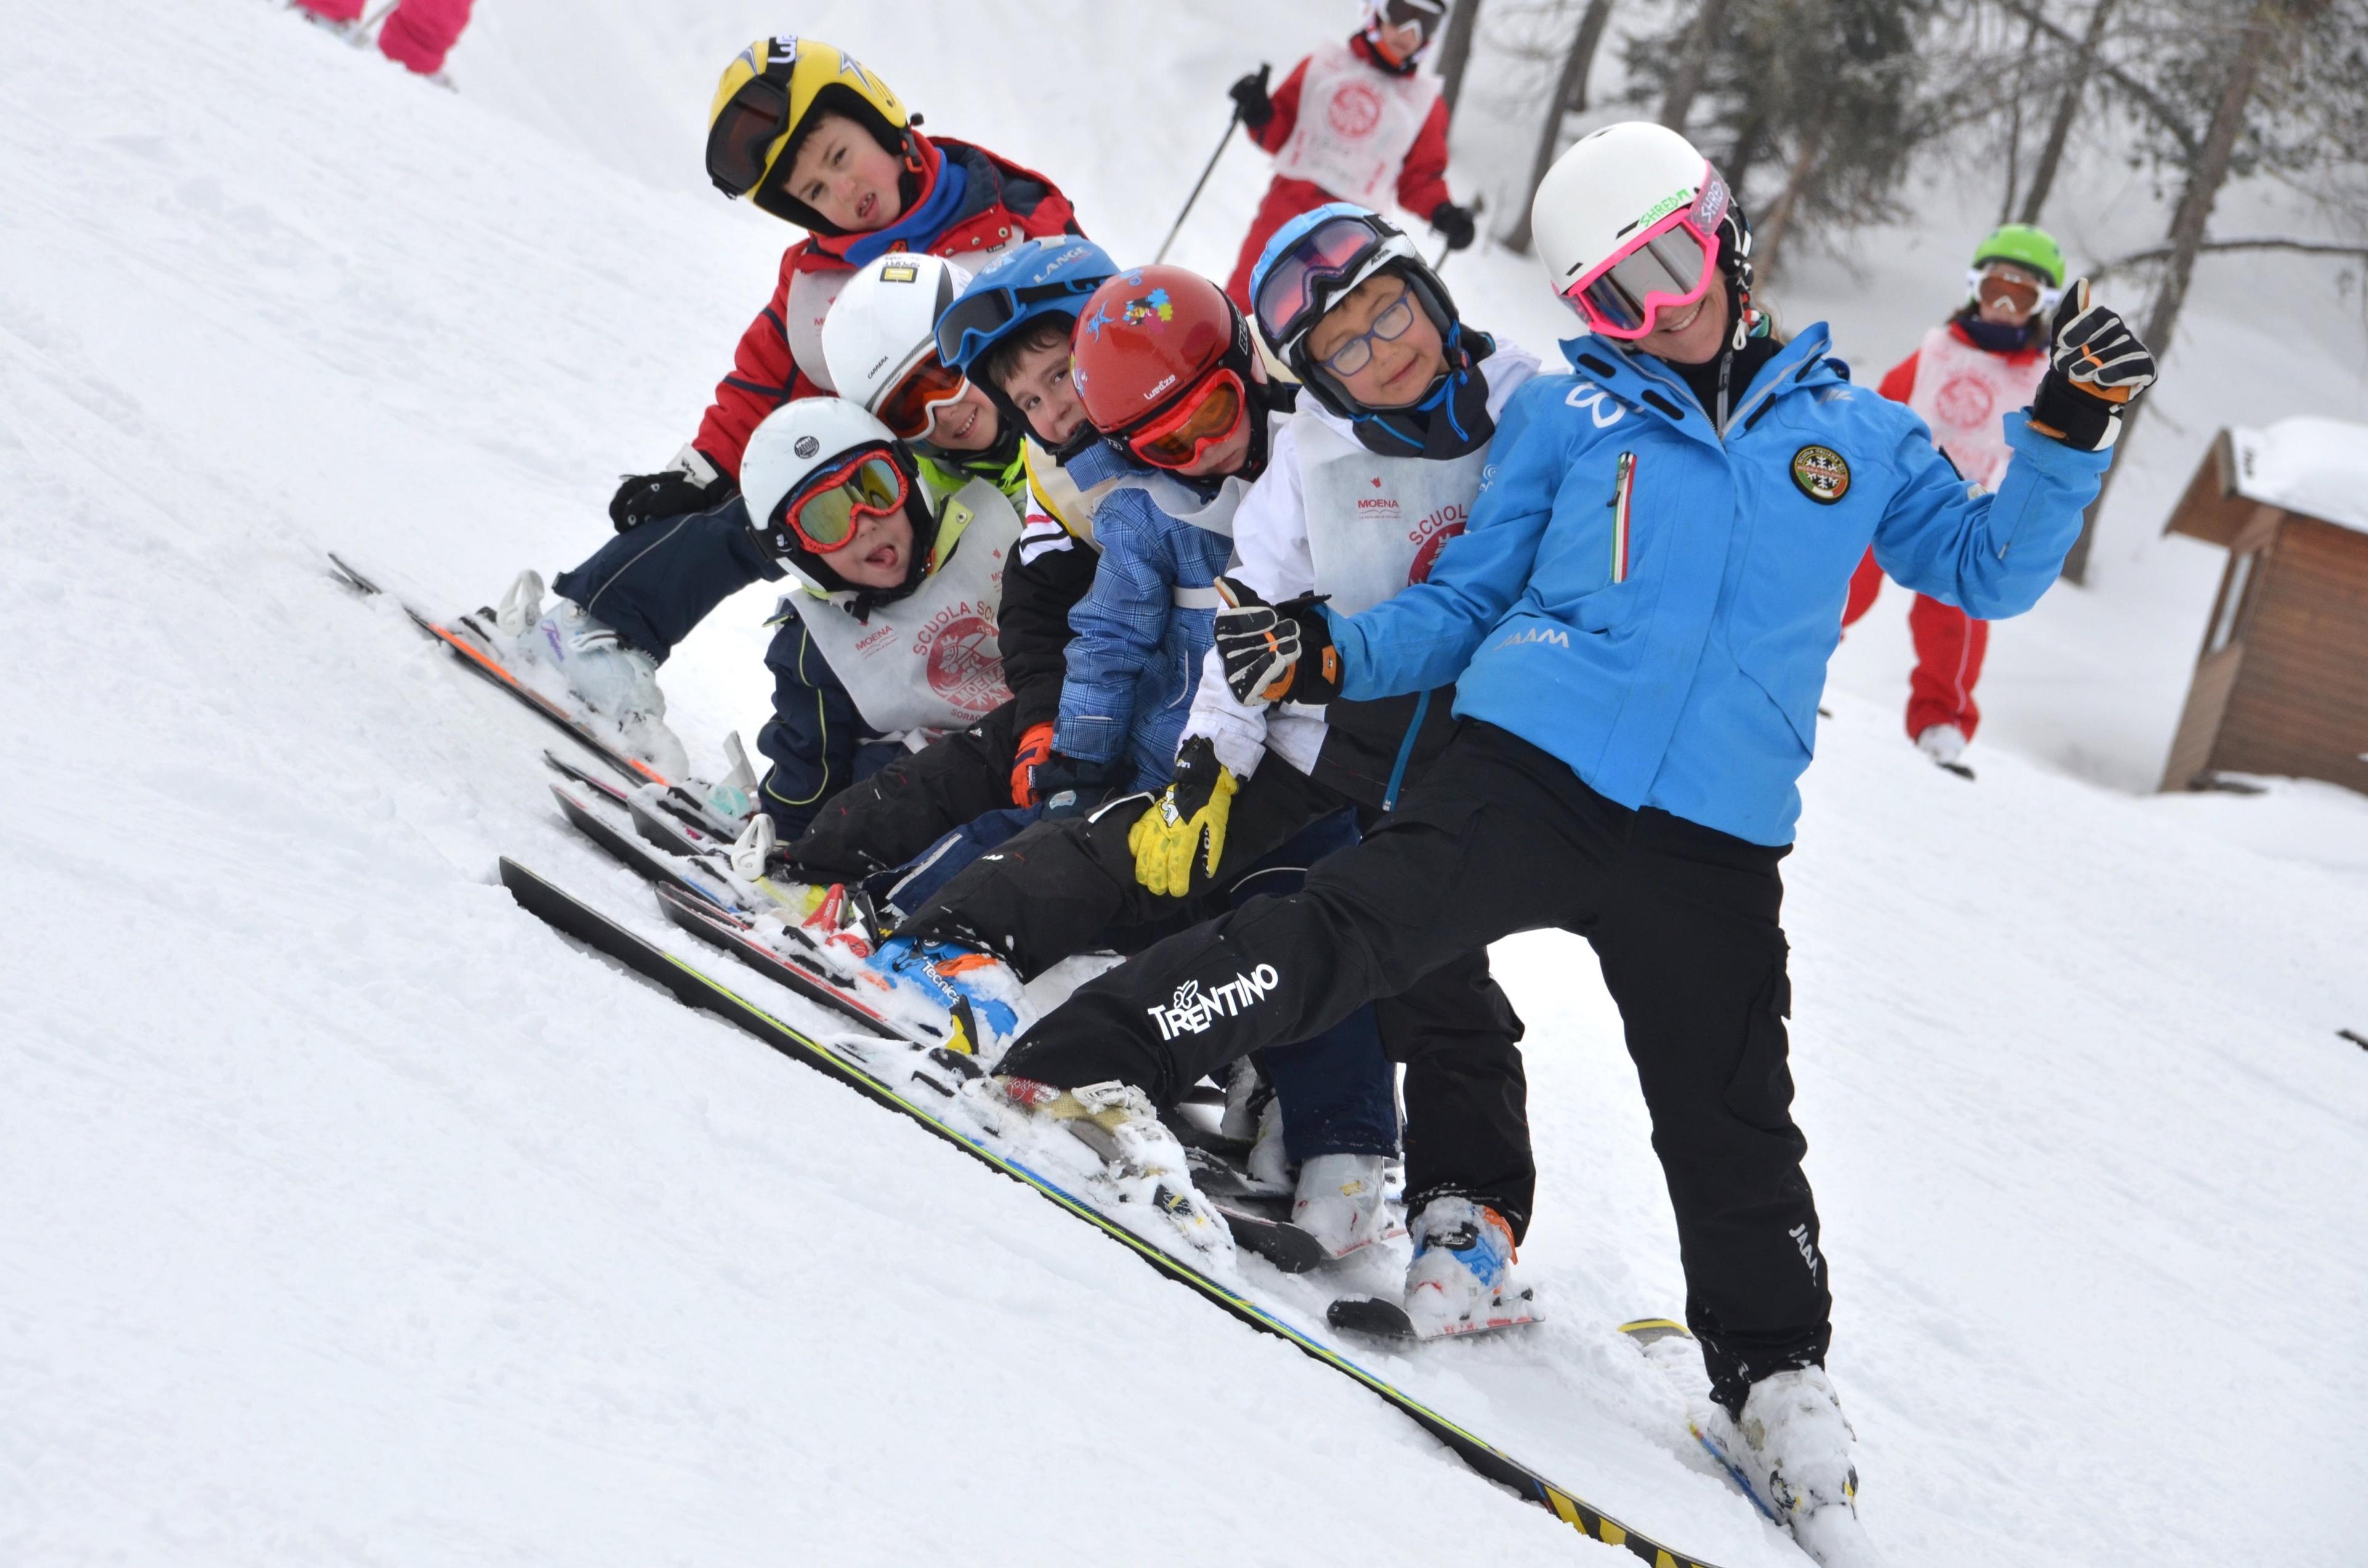 Ski Lessons for Kids (6-14 years) - Low Season - Advanced